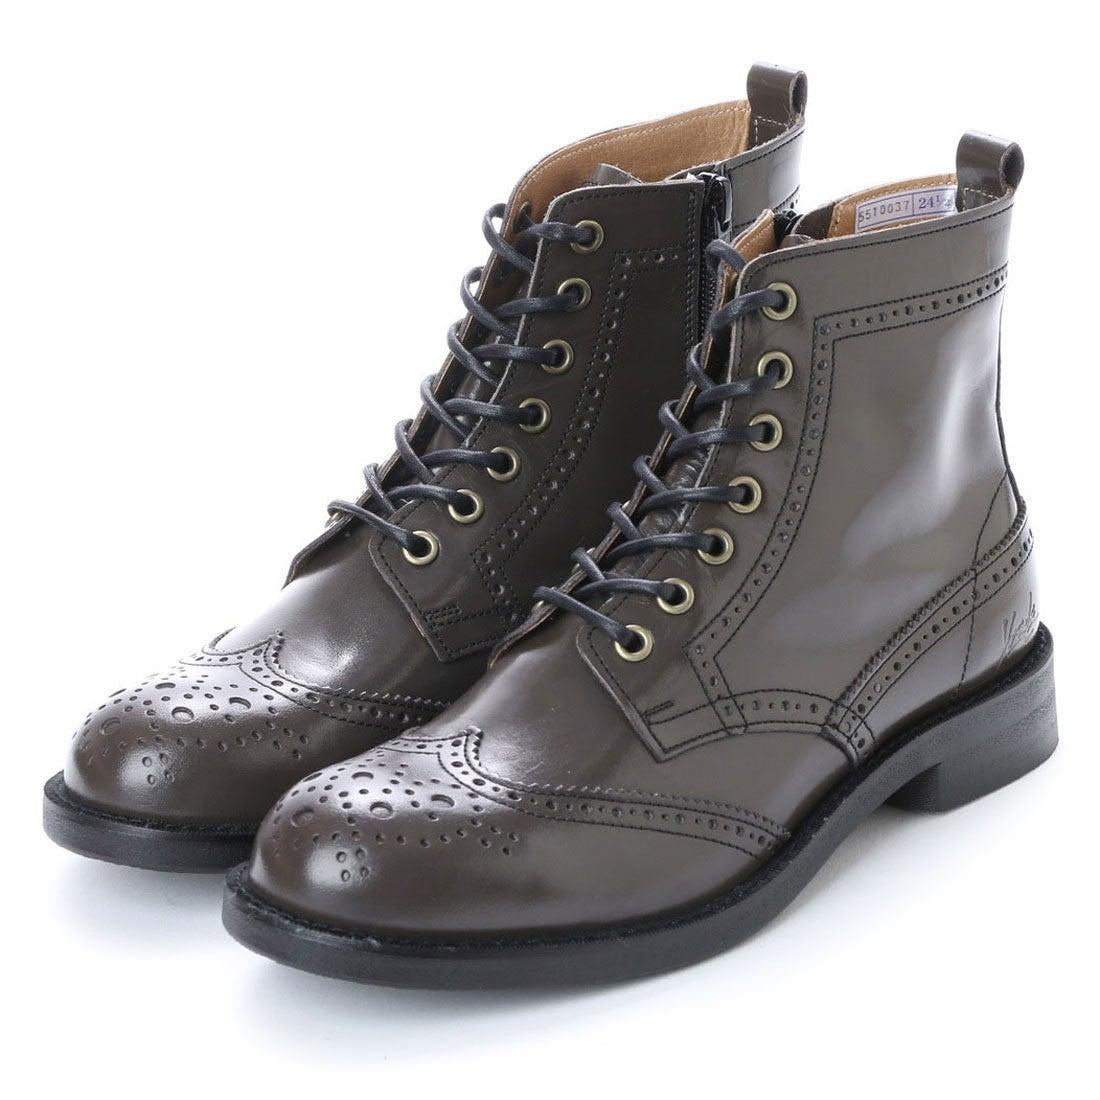 b06ef6b1689a ヨースケ YOSUKE 本革レースアップブーツ (グレー) -靴&ファッション通販 ロコンド〜自宅で試着、気軽に返品